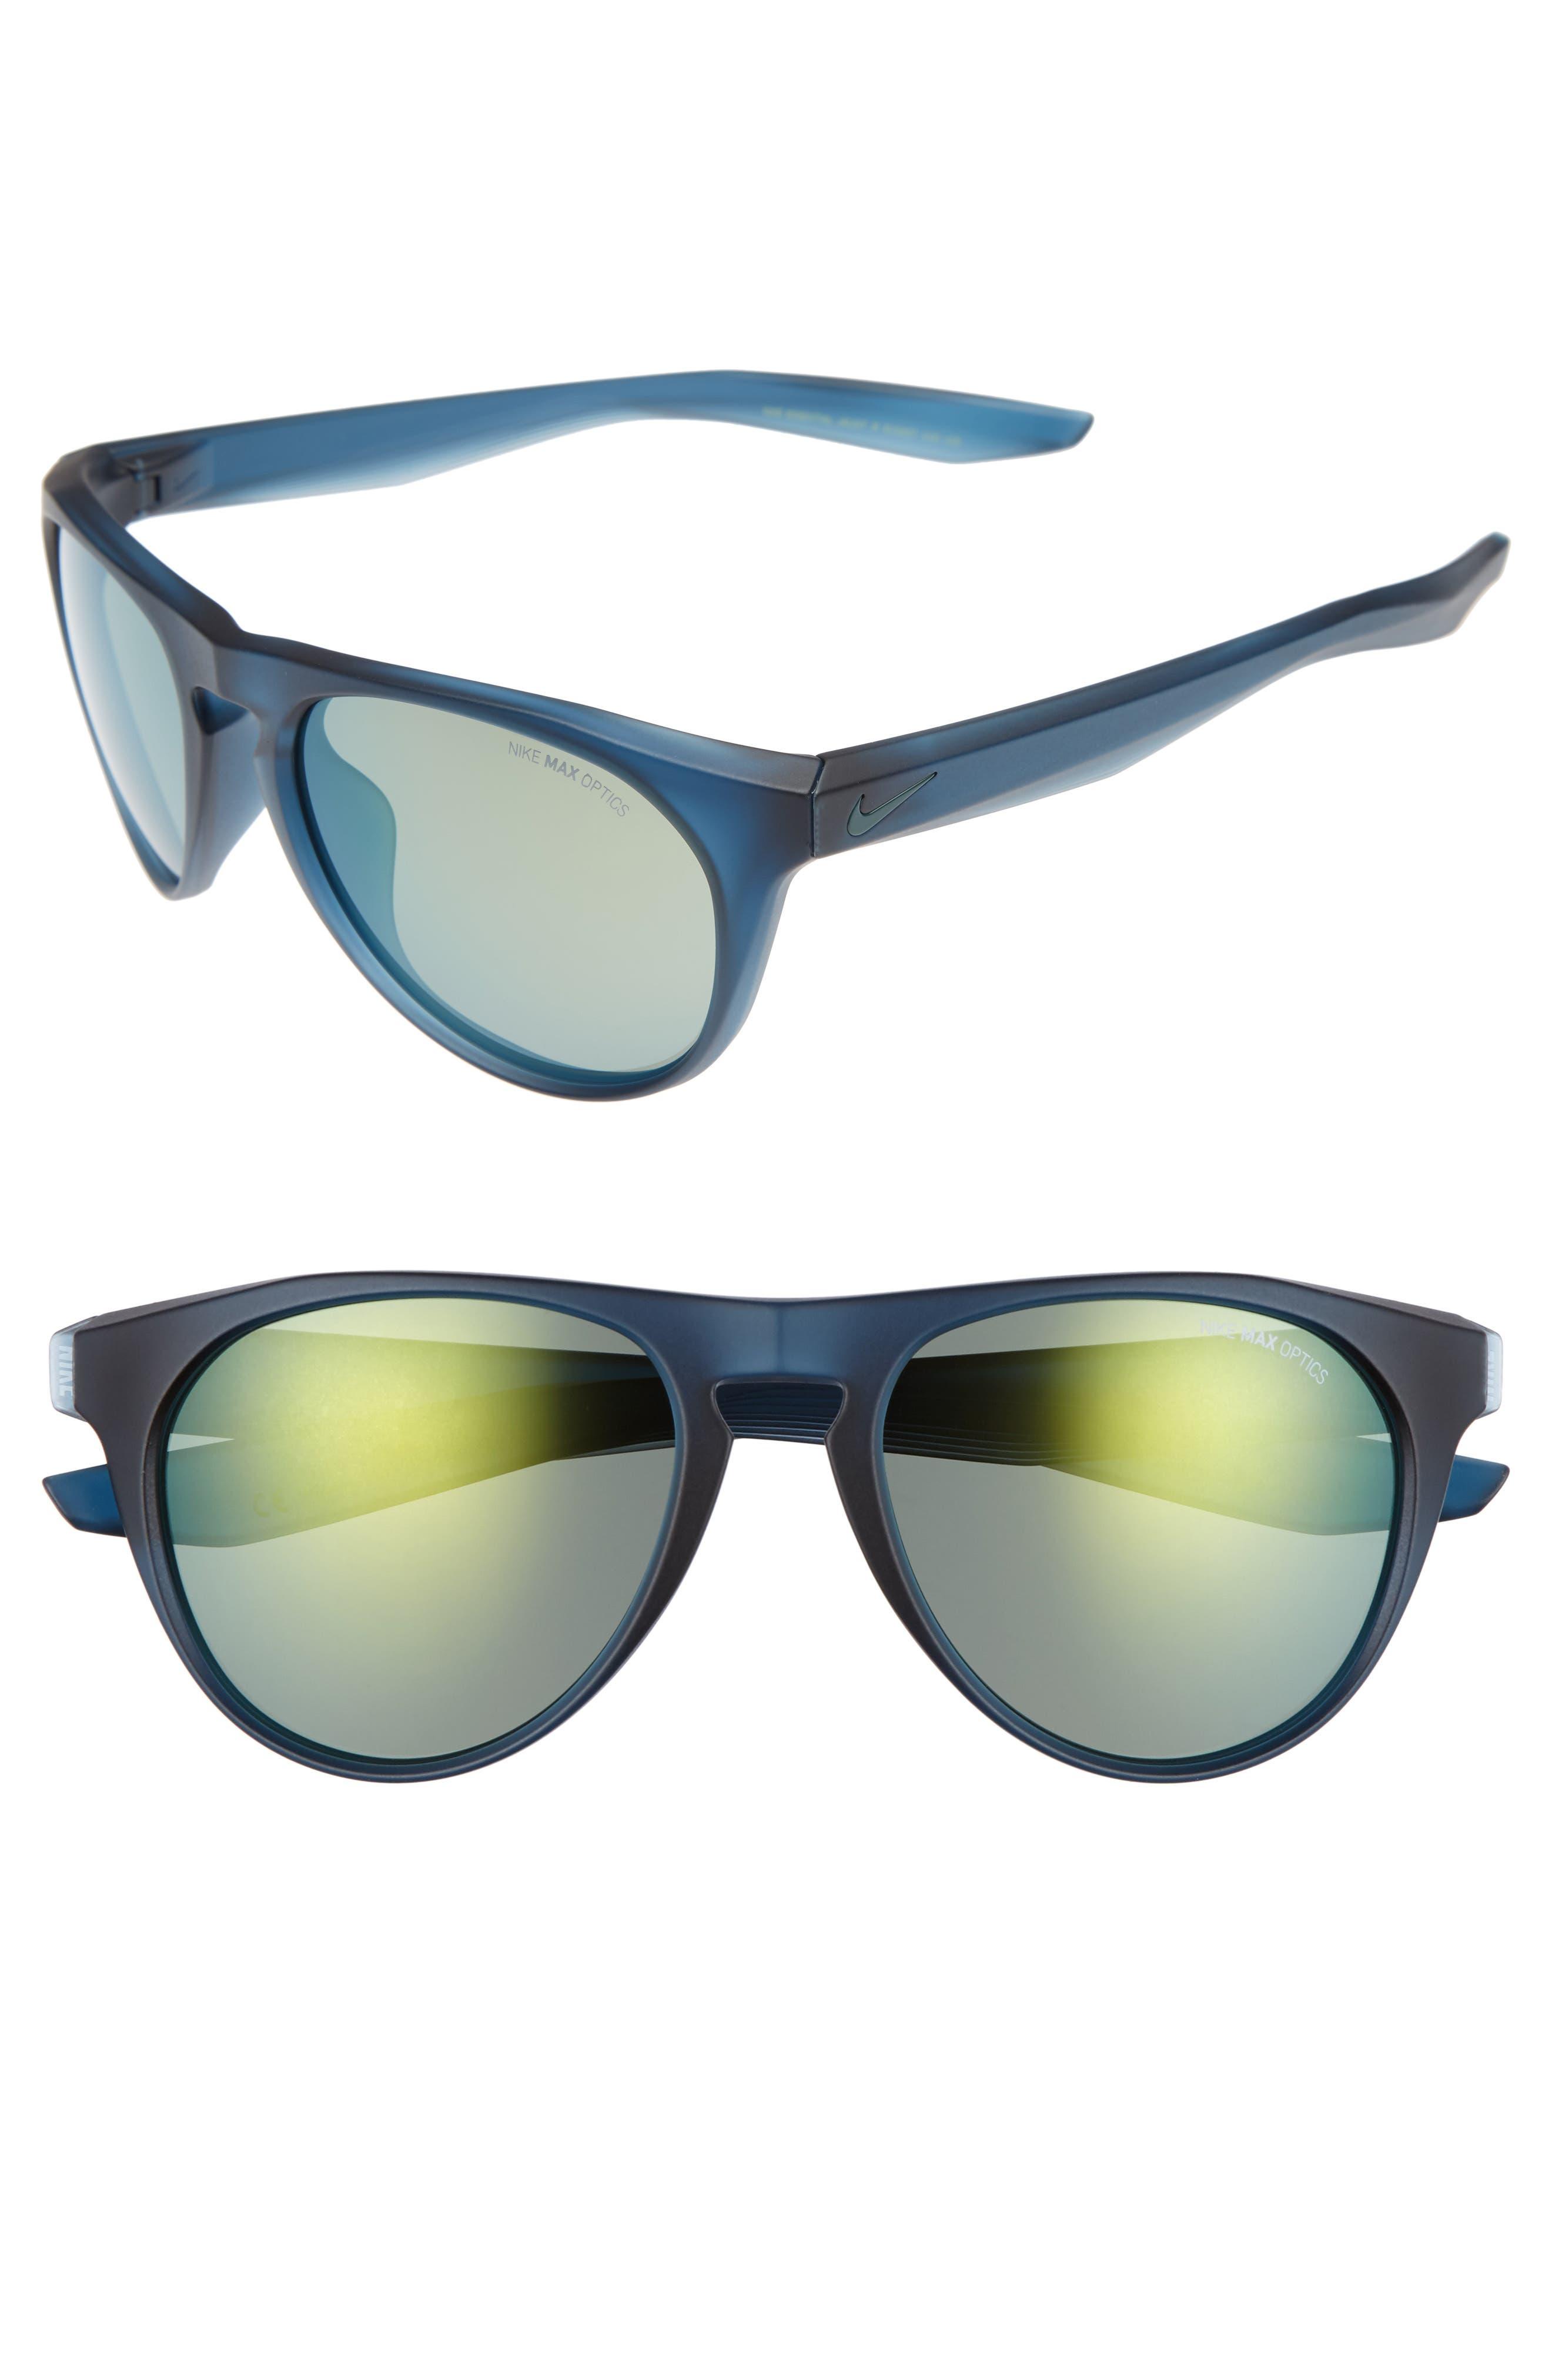 Nike Essential Jaunt R 5m Sunglasses - Matte Squadron Blue